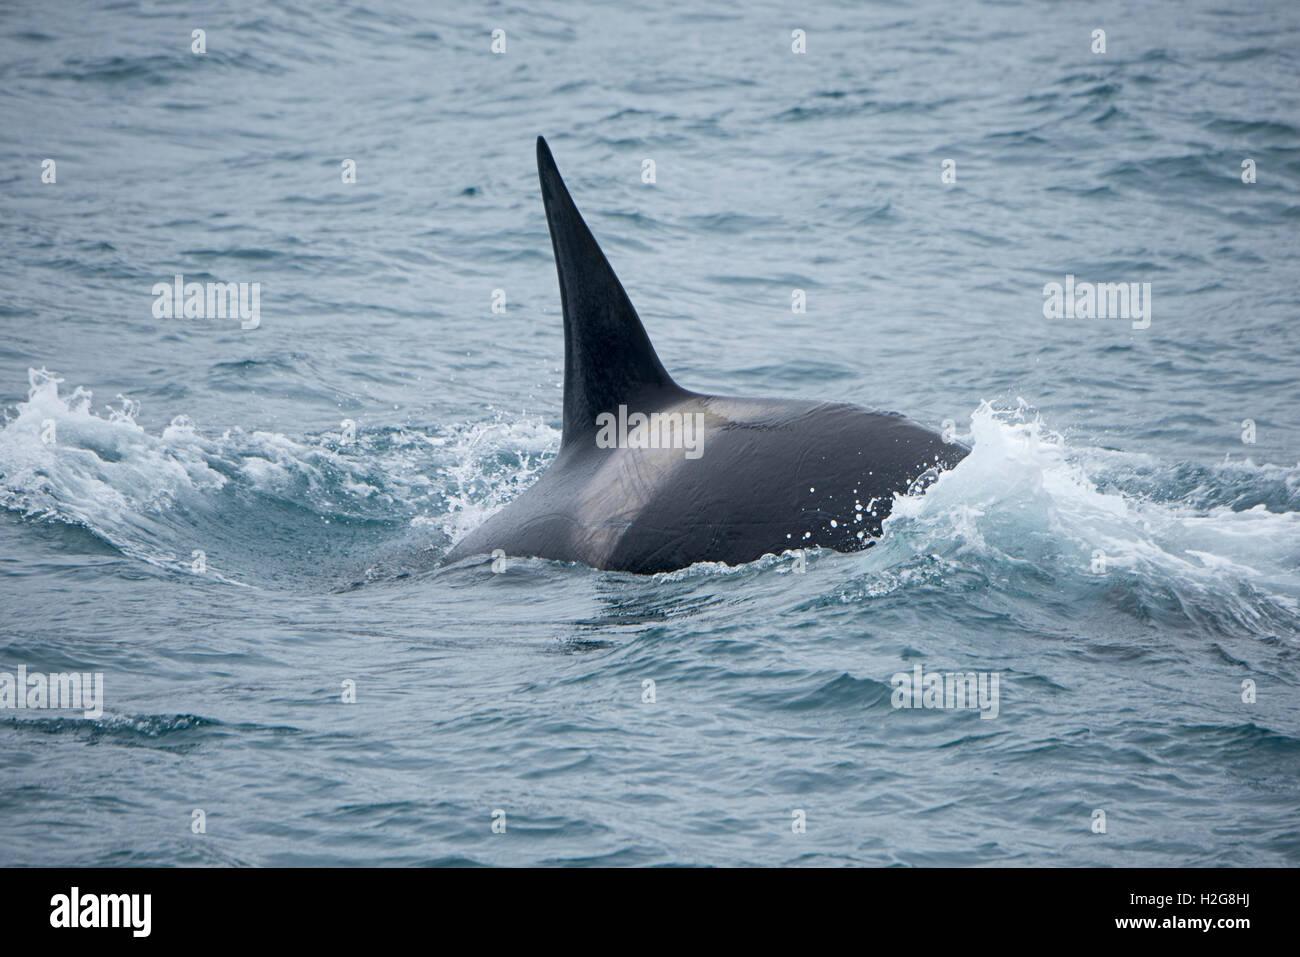 Killer Whale Orcinus orca off South Georgia - Stock Image